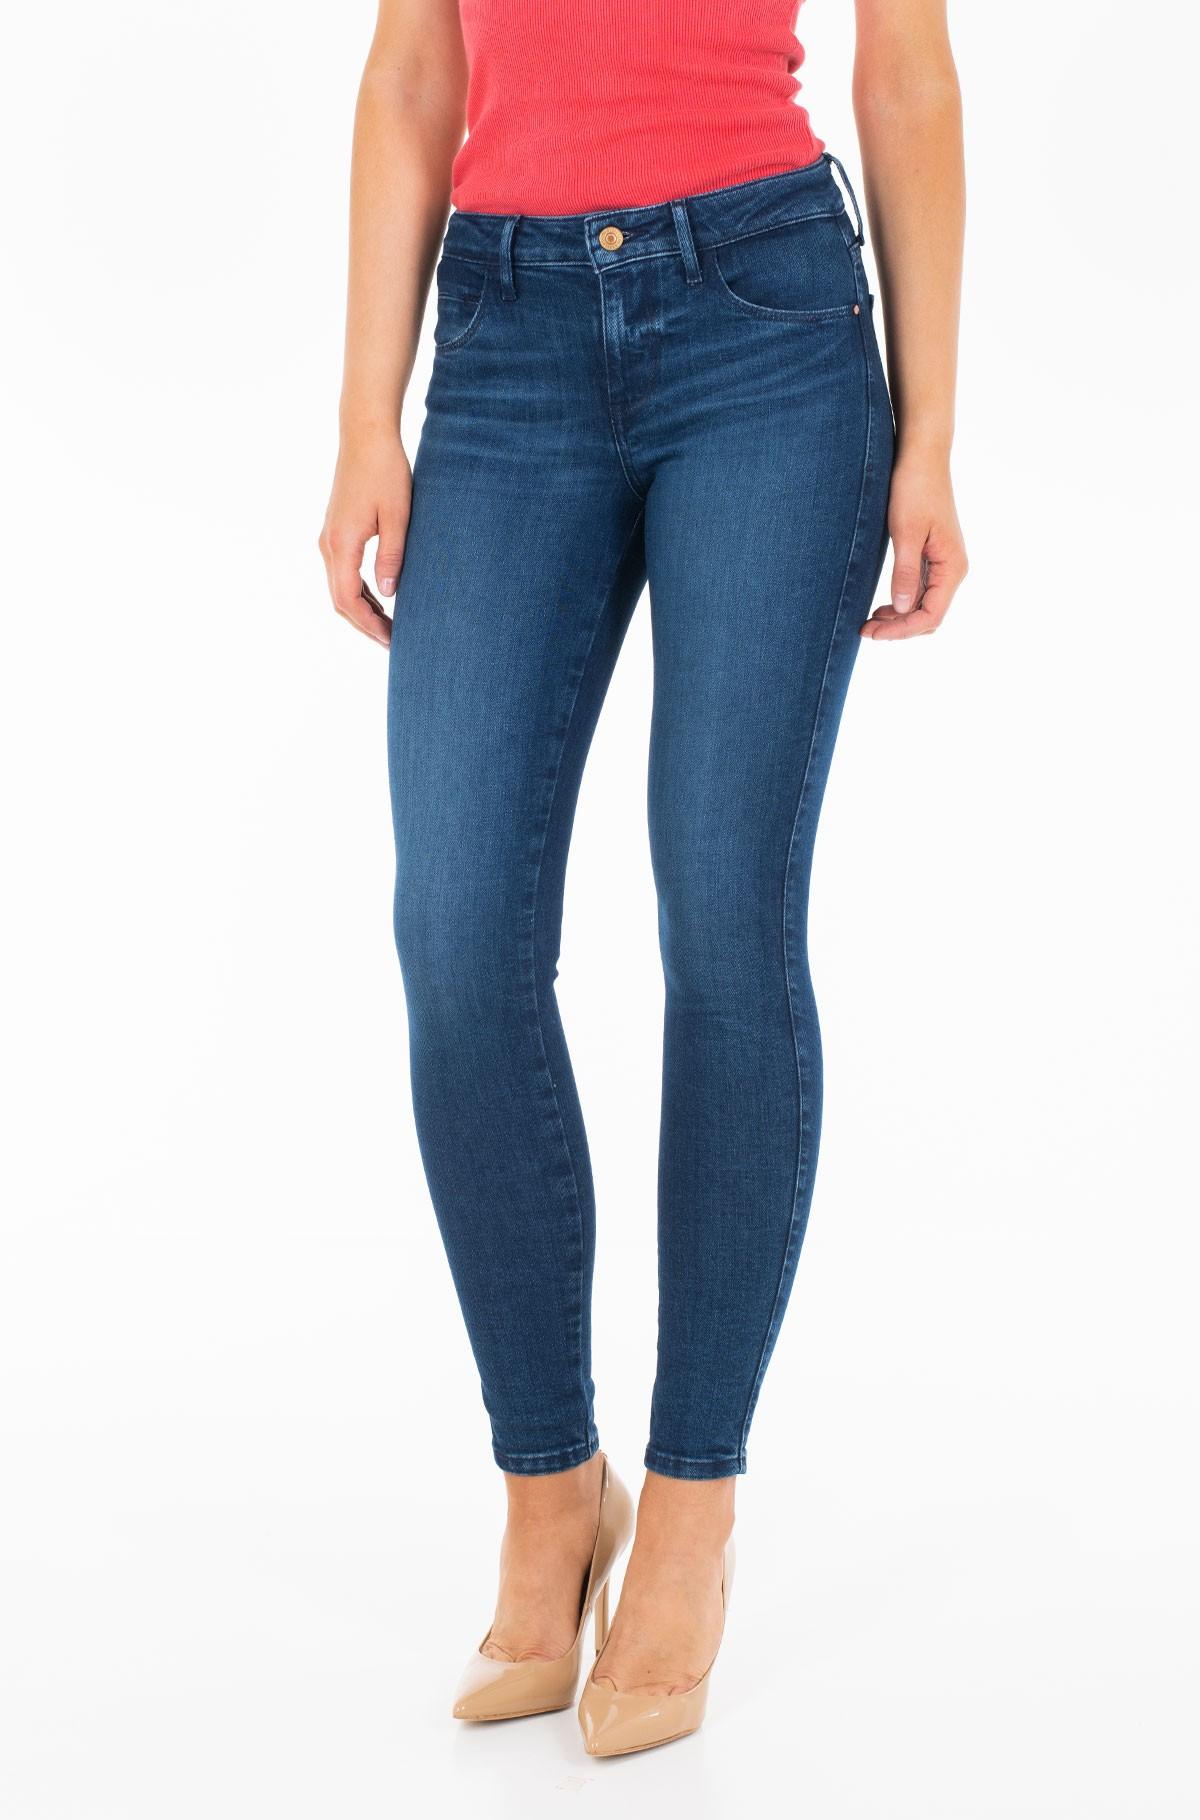 Jeans WB9AJ3 D3NQ0-full-1